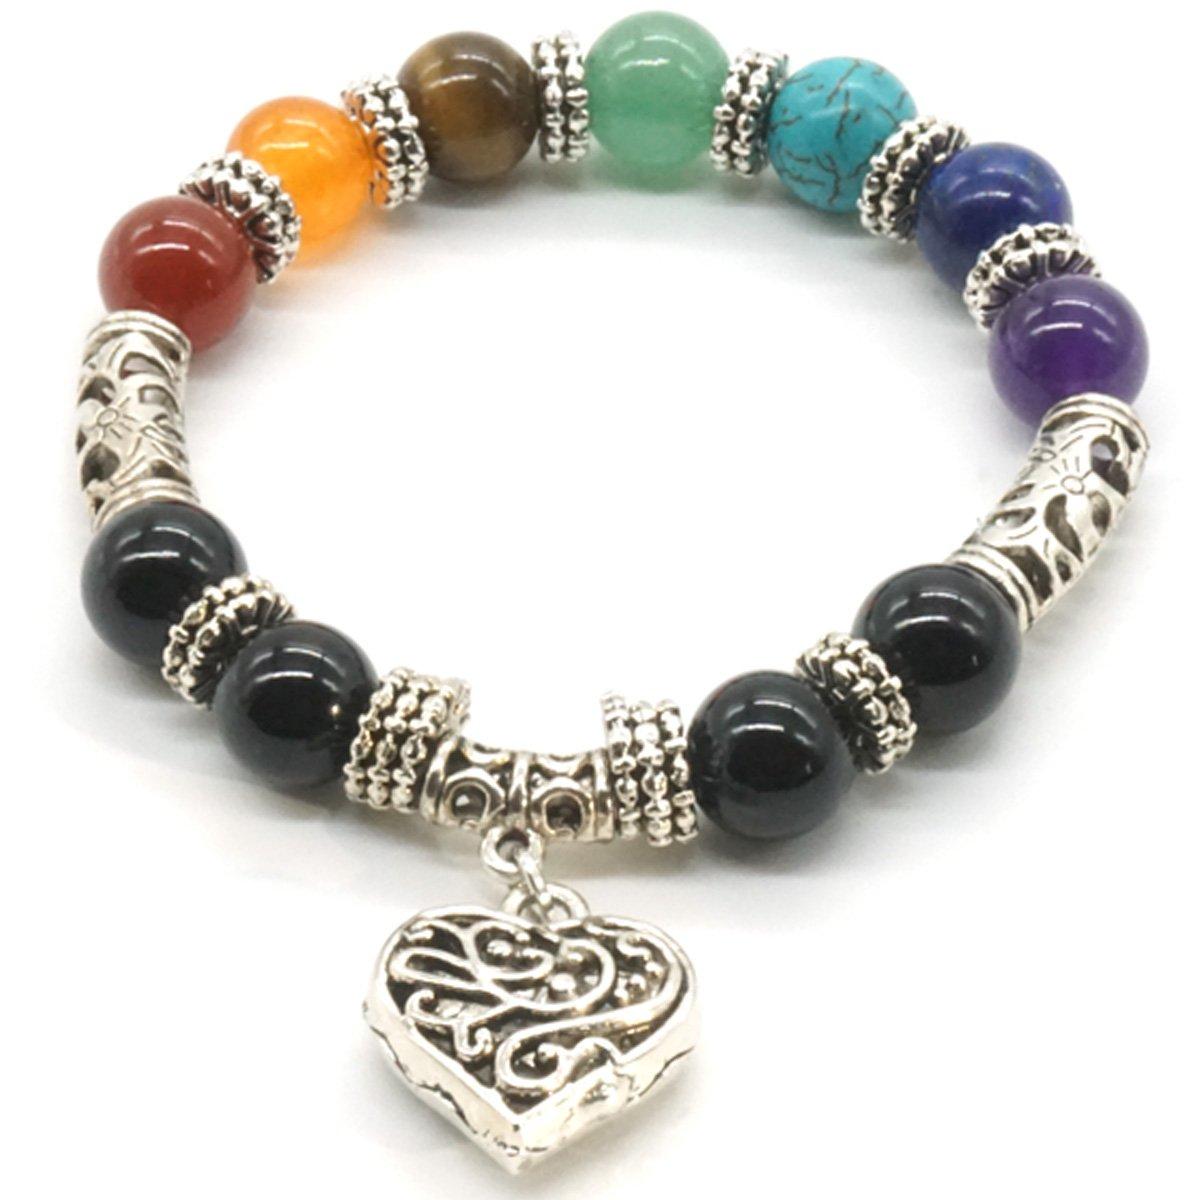 10 MM Perles Yoga Balancing Reiki Healing Bracelet 7 Chakra Antique Argent Couleur Hollow Coeur Bracelet Mayting BST001